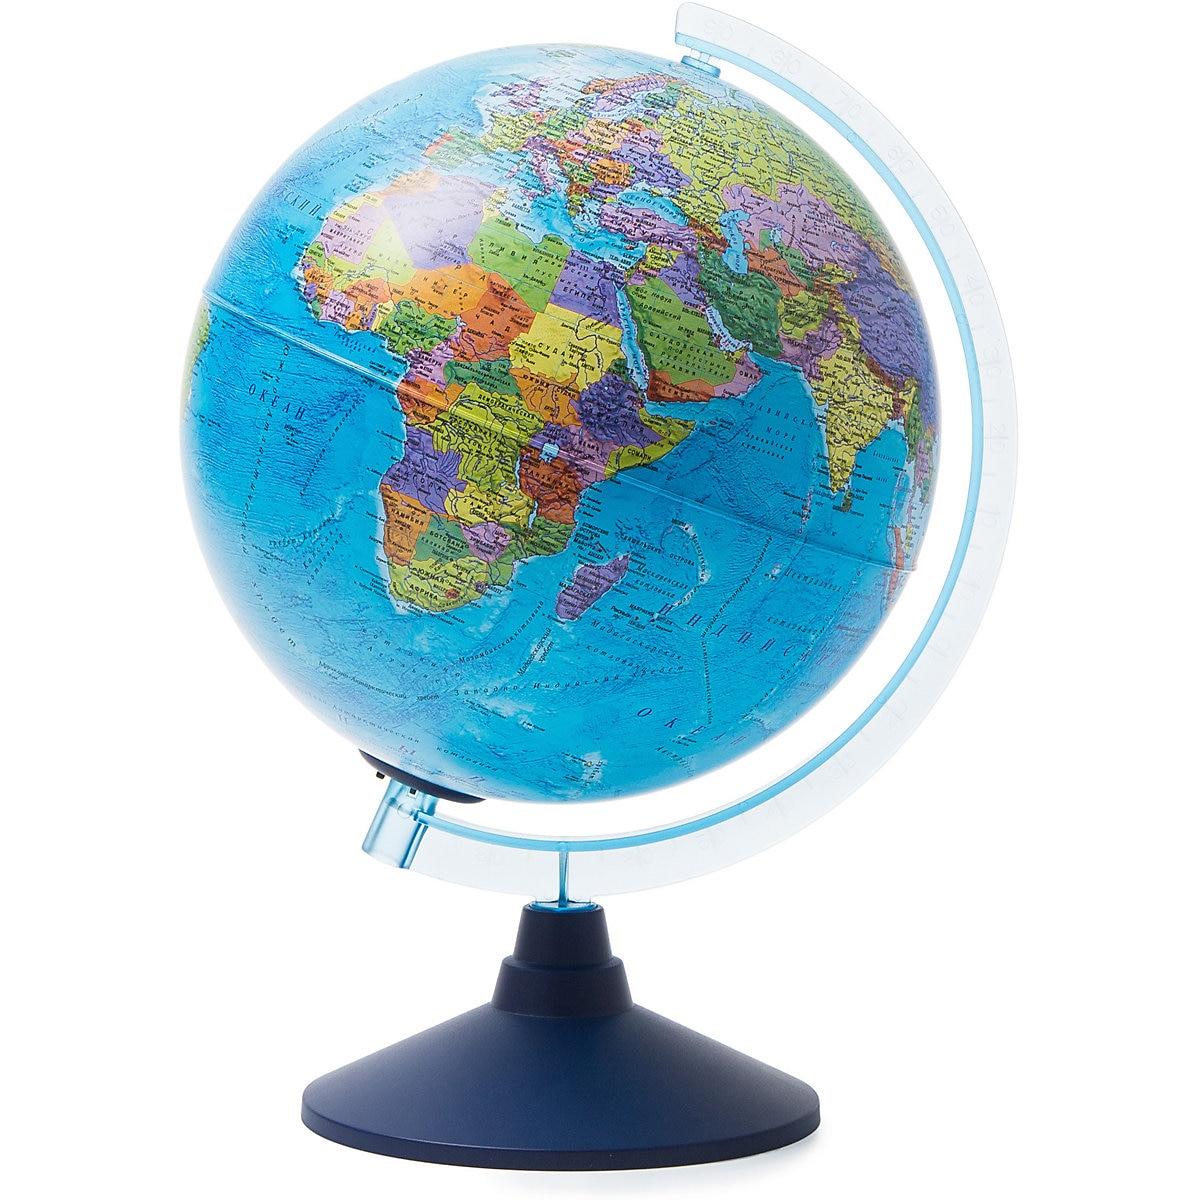 GLOBEN Desk Set 8075087 globe Accessories Organizer for office and school schools offices MTpromo globen desk set 7327225 globe accessories organizer for office and school schools offices